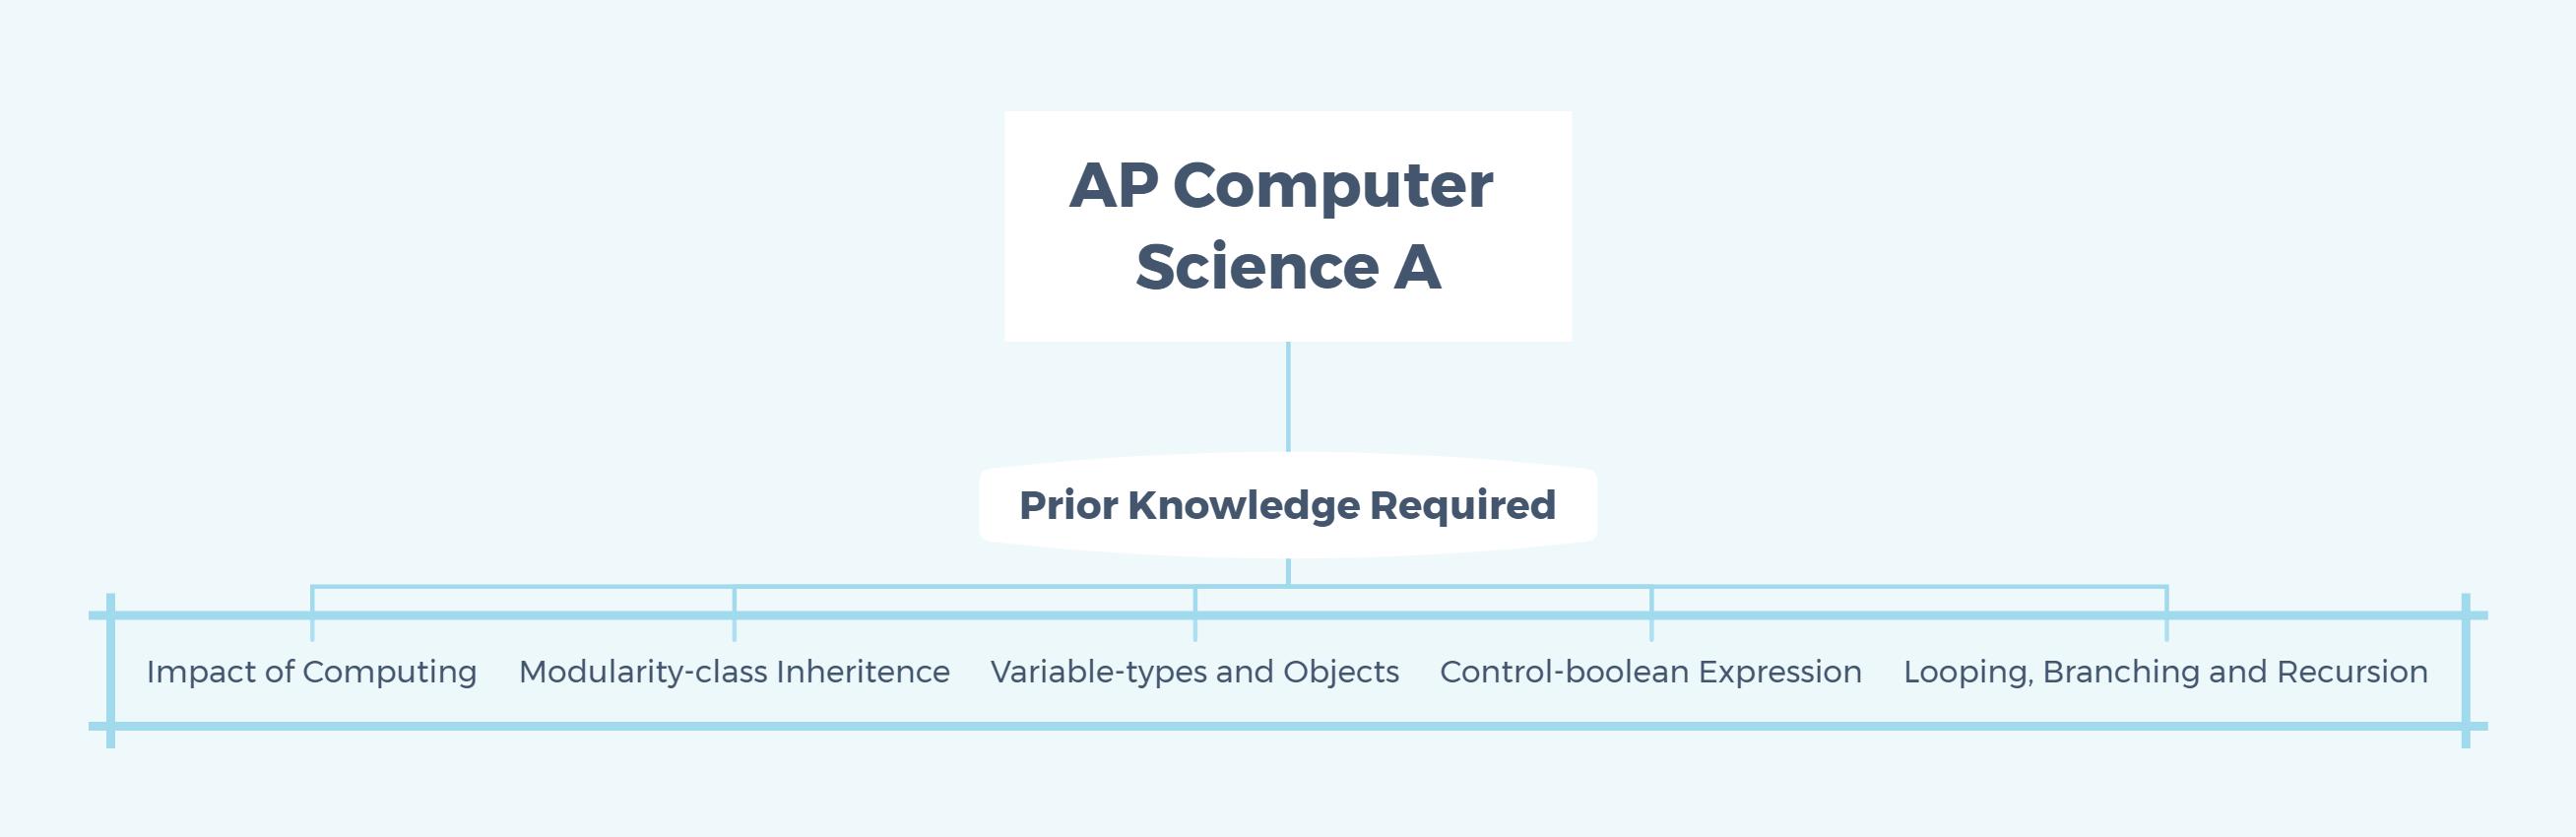 AP computer science A content